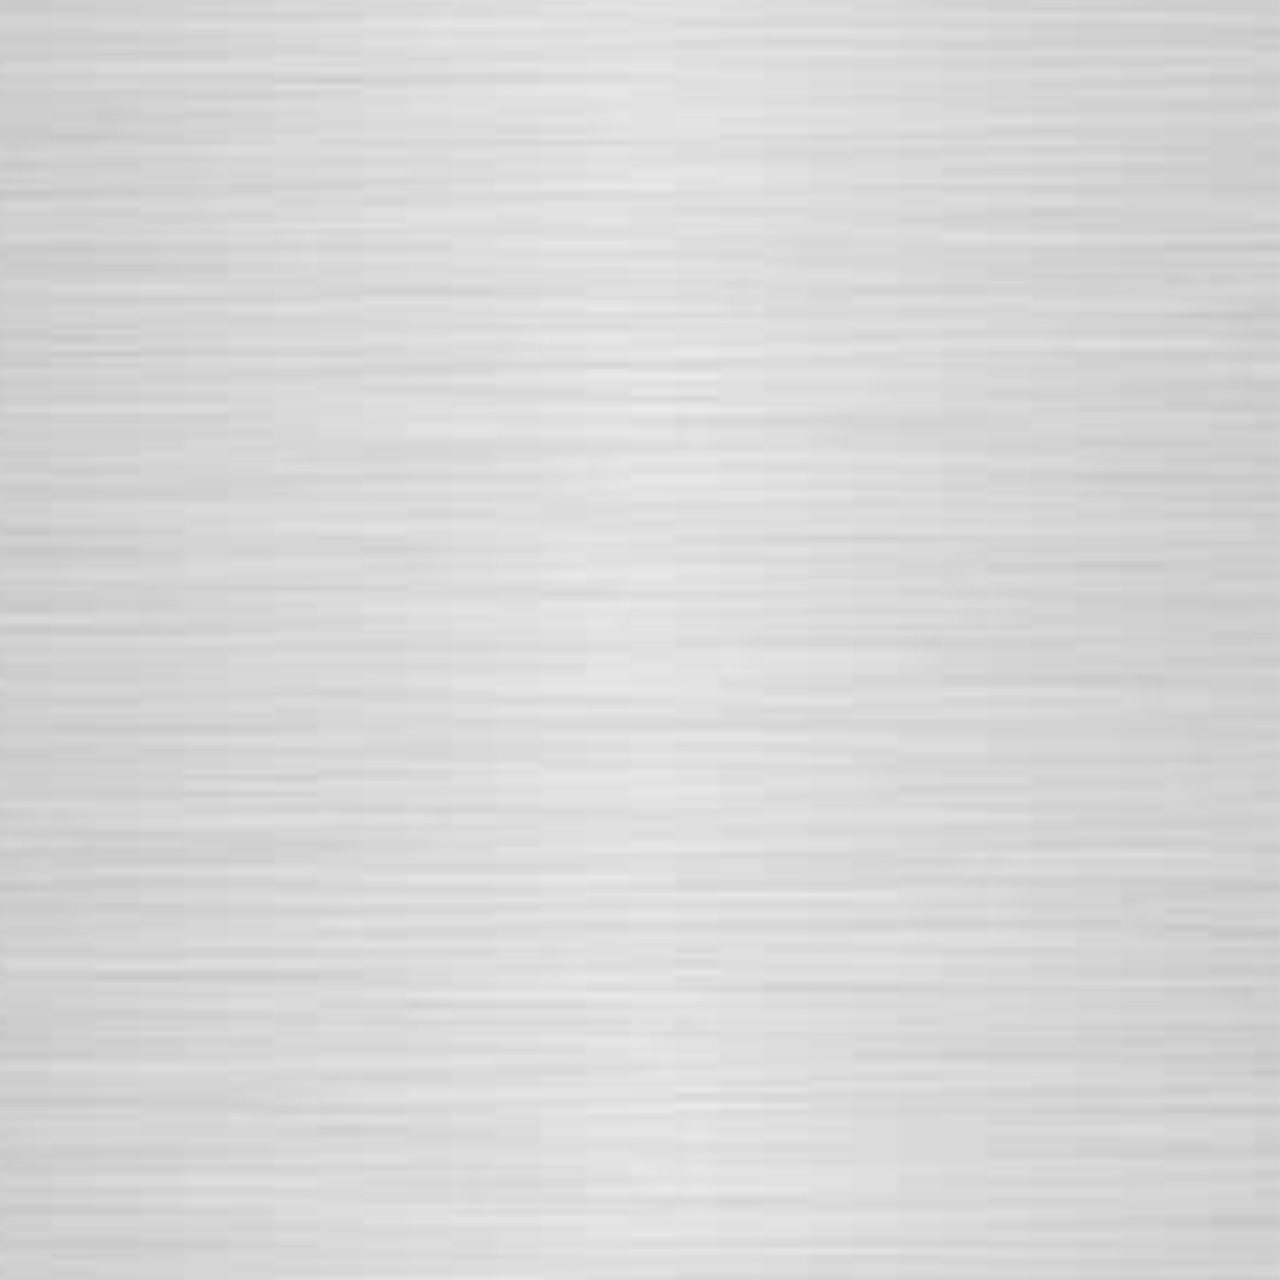 Алюкобонд царапанное серебро 88117 (3мм/28мкм) 1,22мХ2,44м